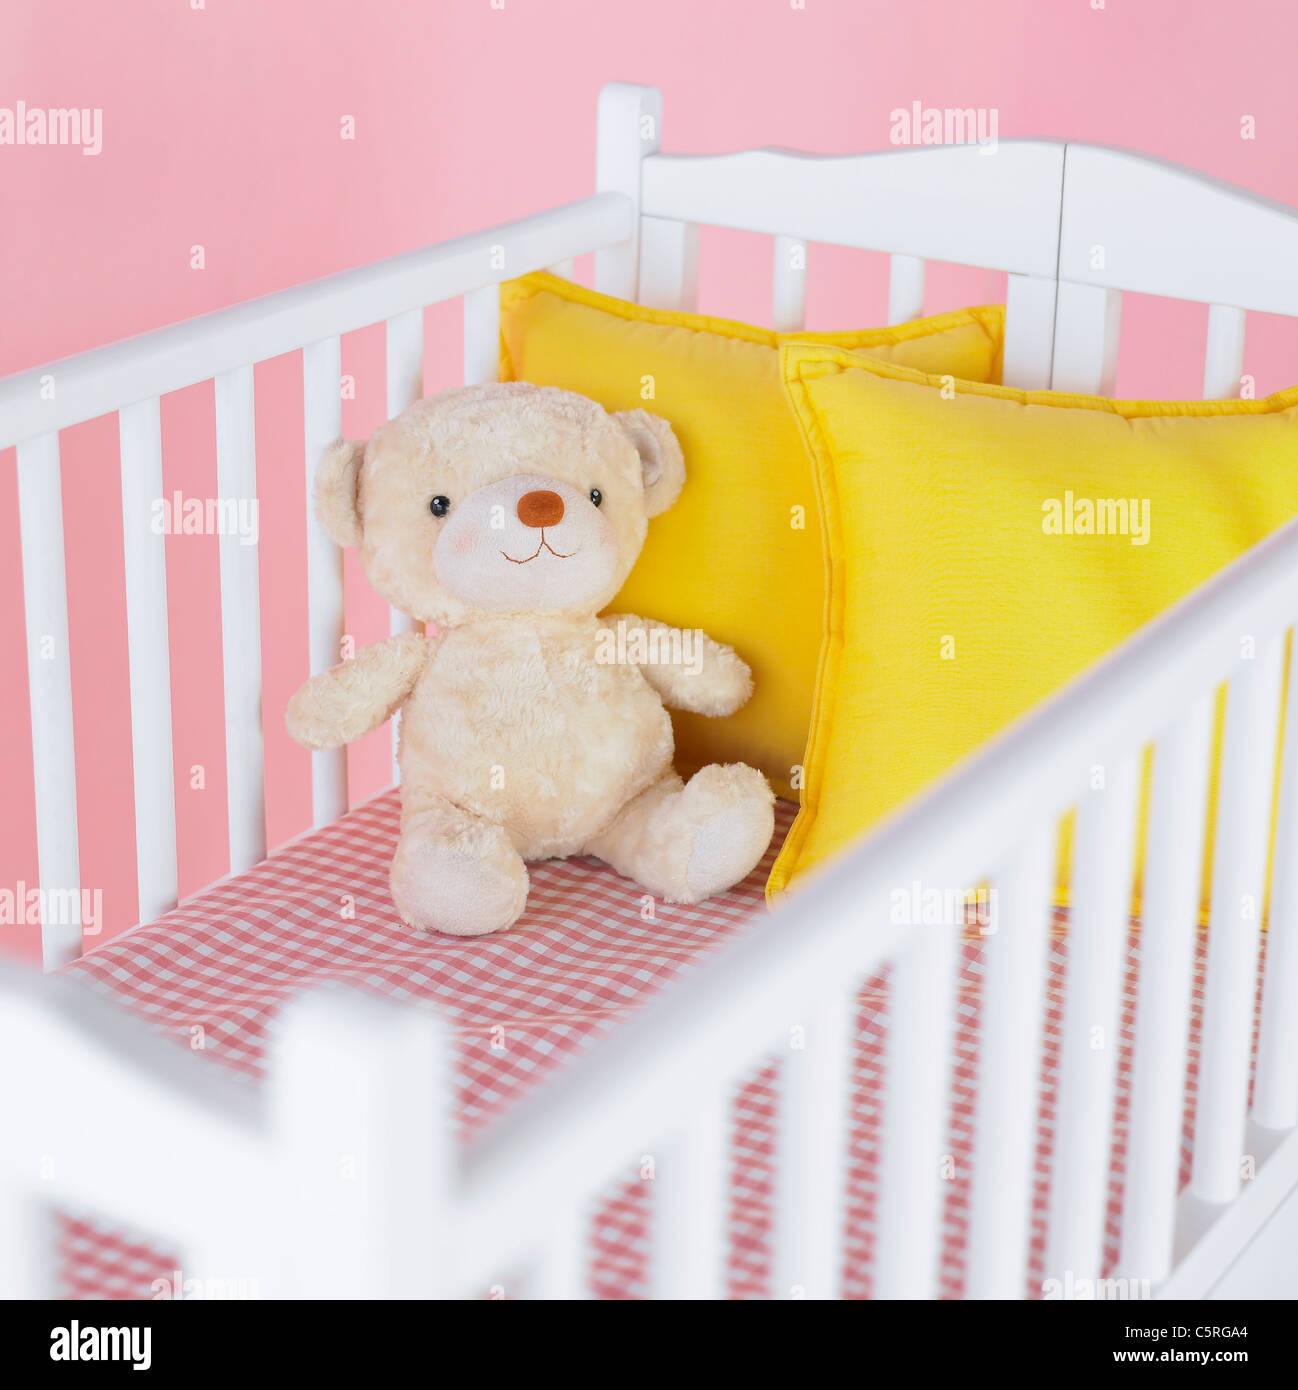 Arapha Newborns Sleep Pillow for Baby Yellow